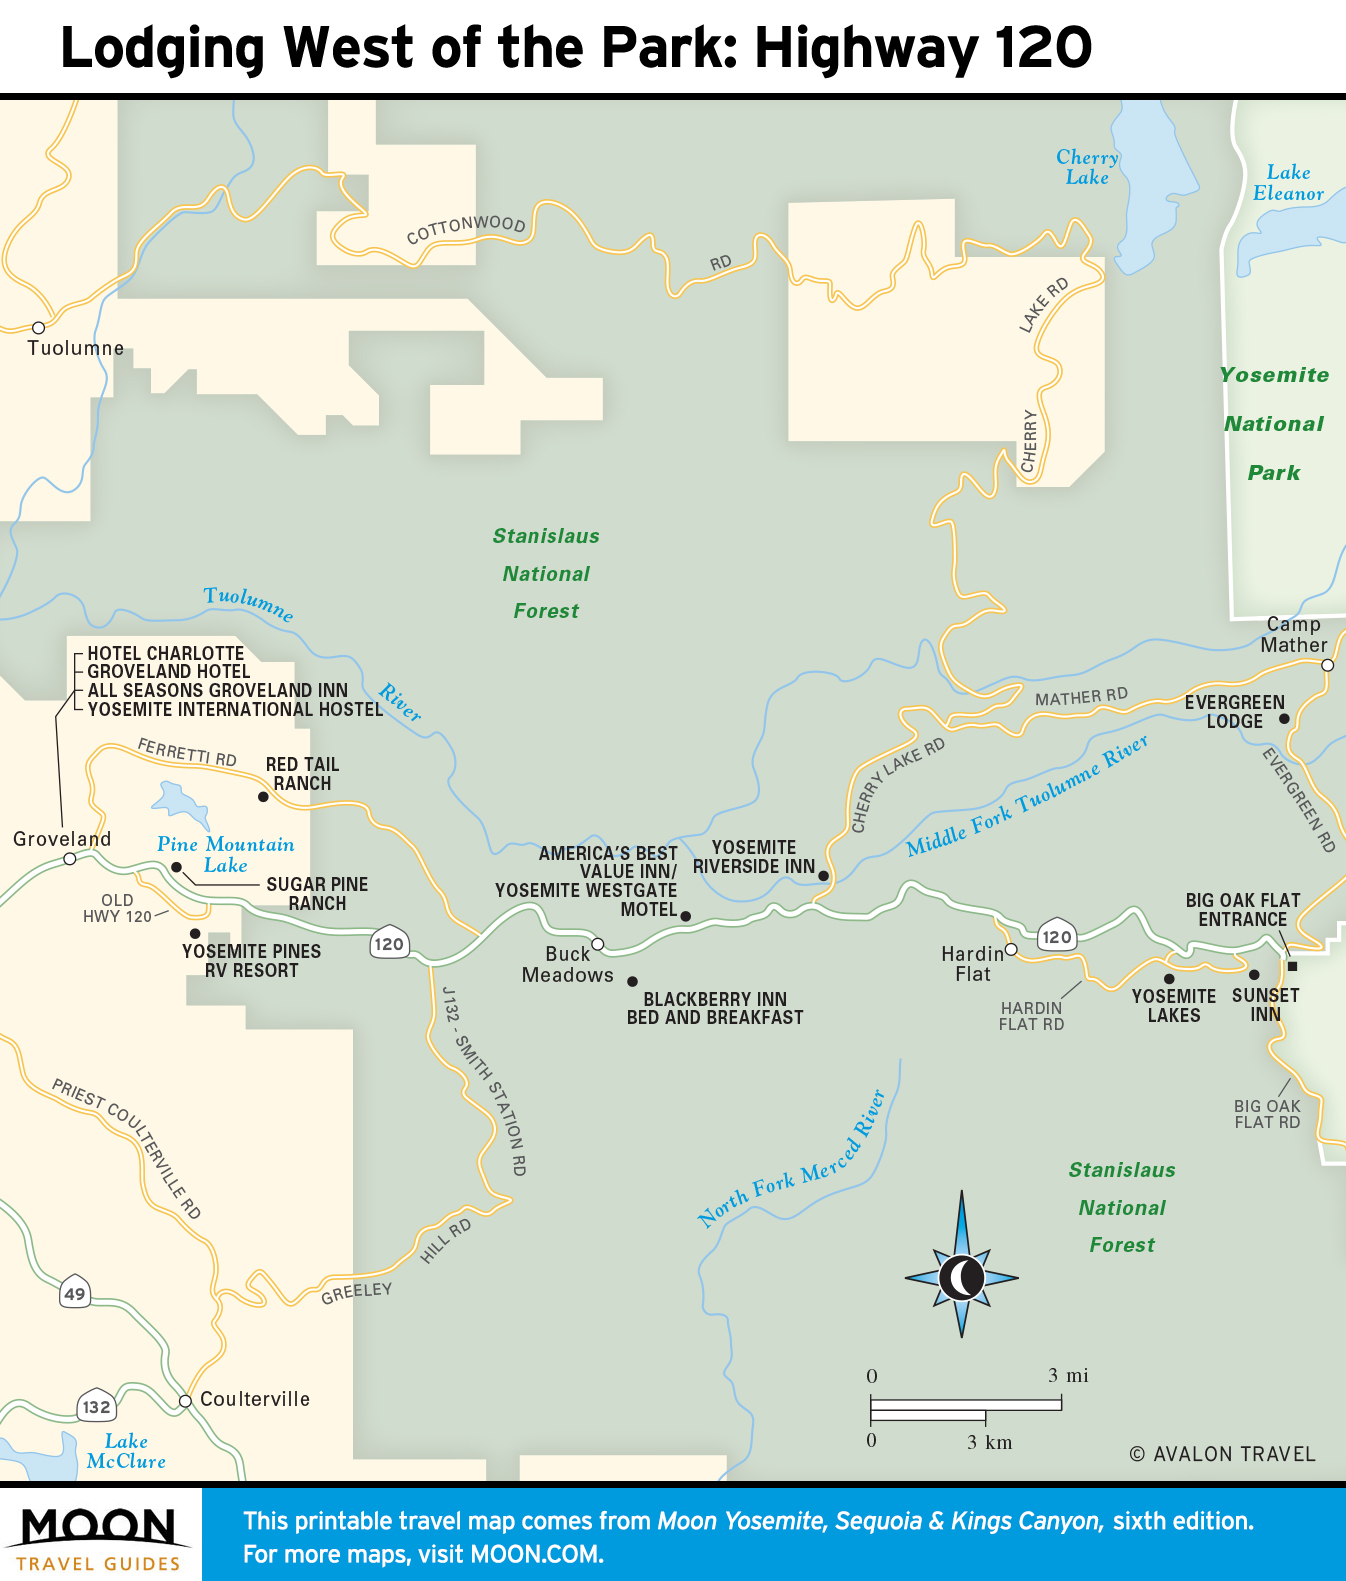 Yosemite National Park | Moon Travel Guides on map of yellowstone park entrances, map of yosemite trails, map of grand canyon entrances, map of disneyland entrances,